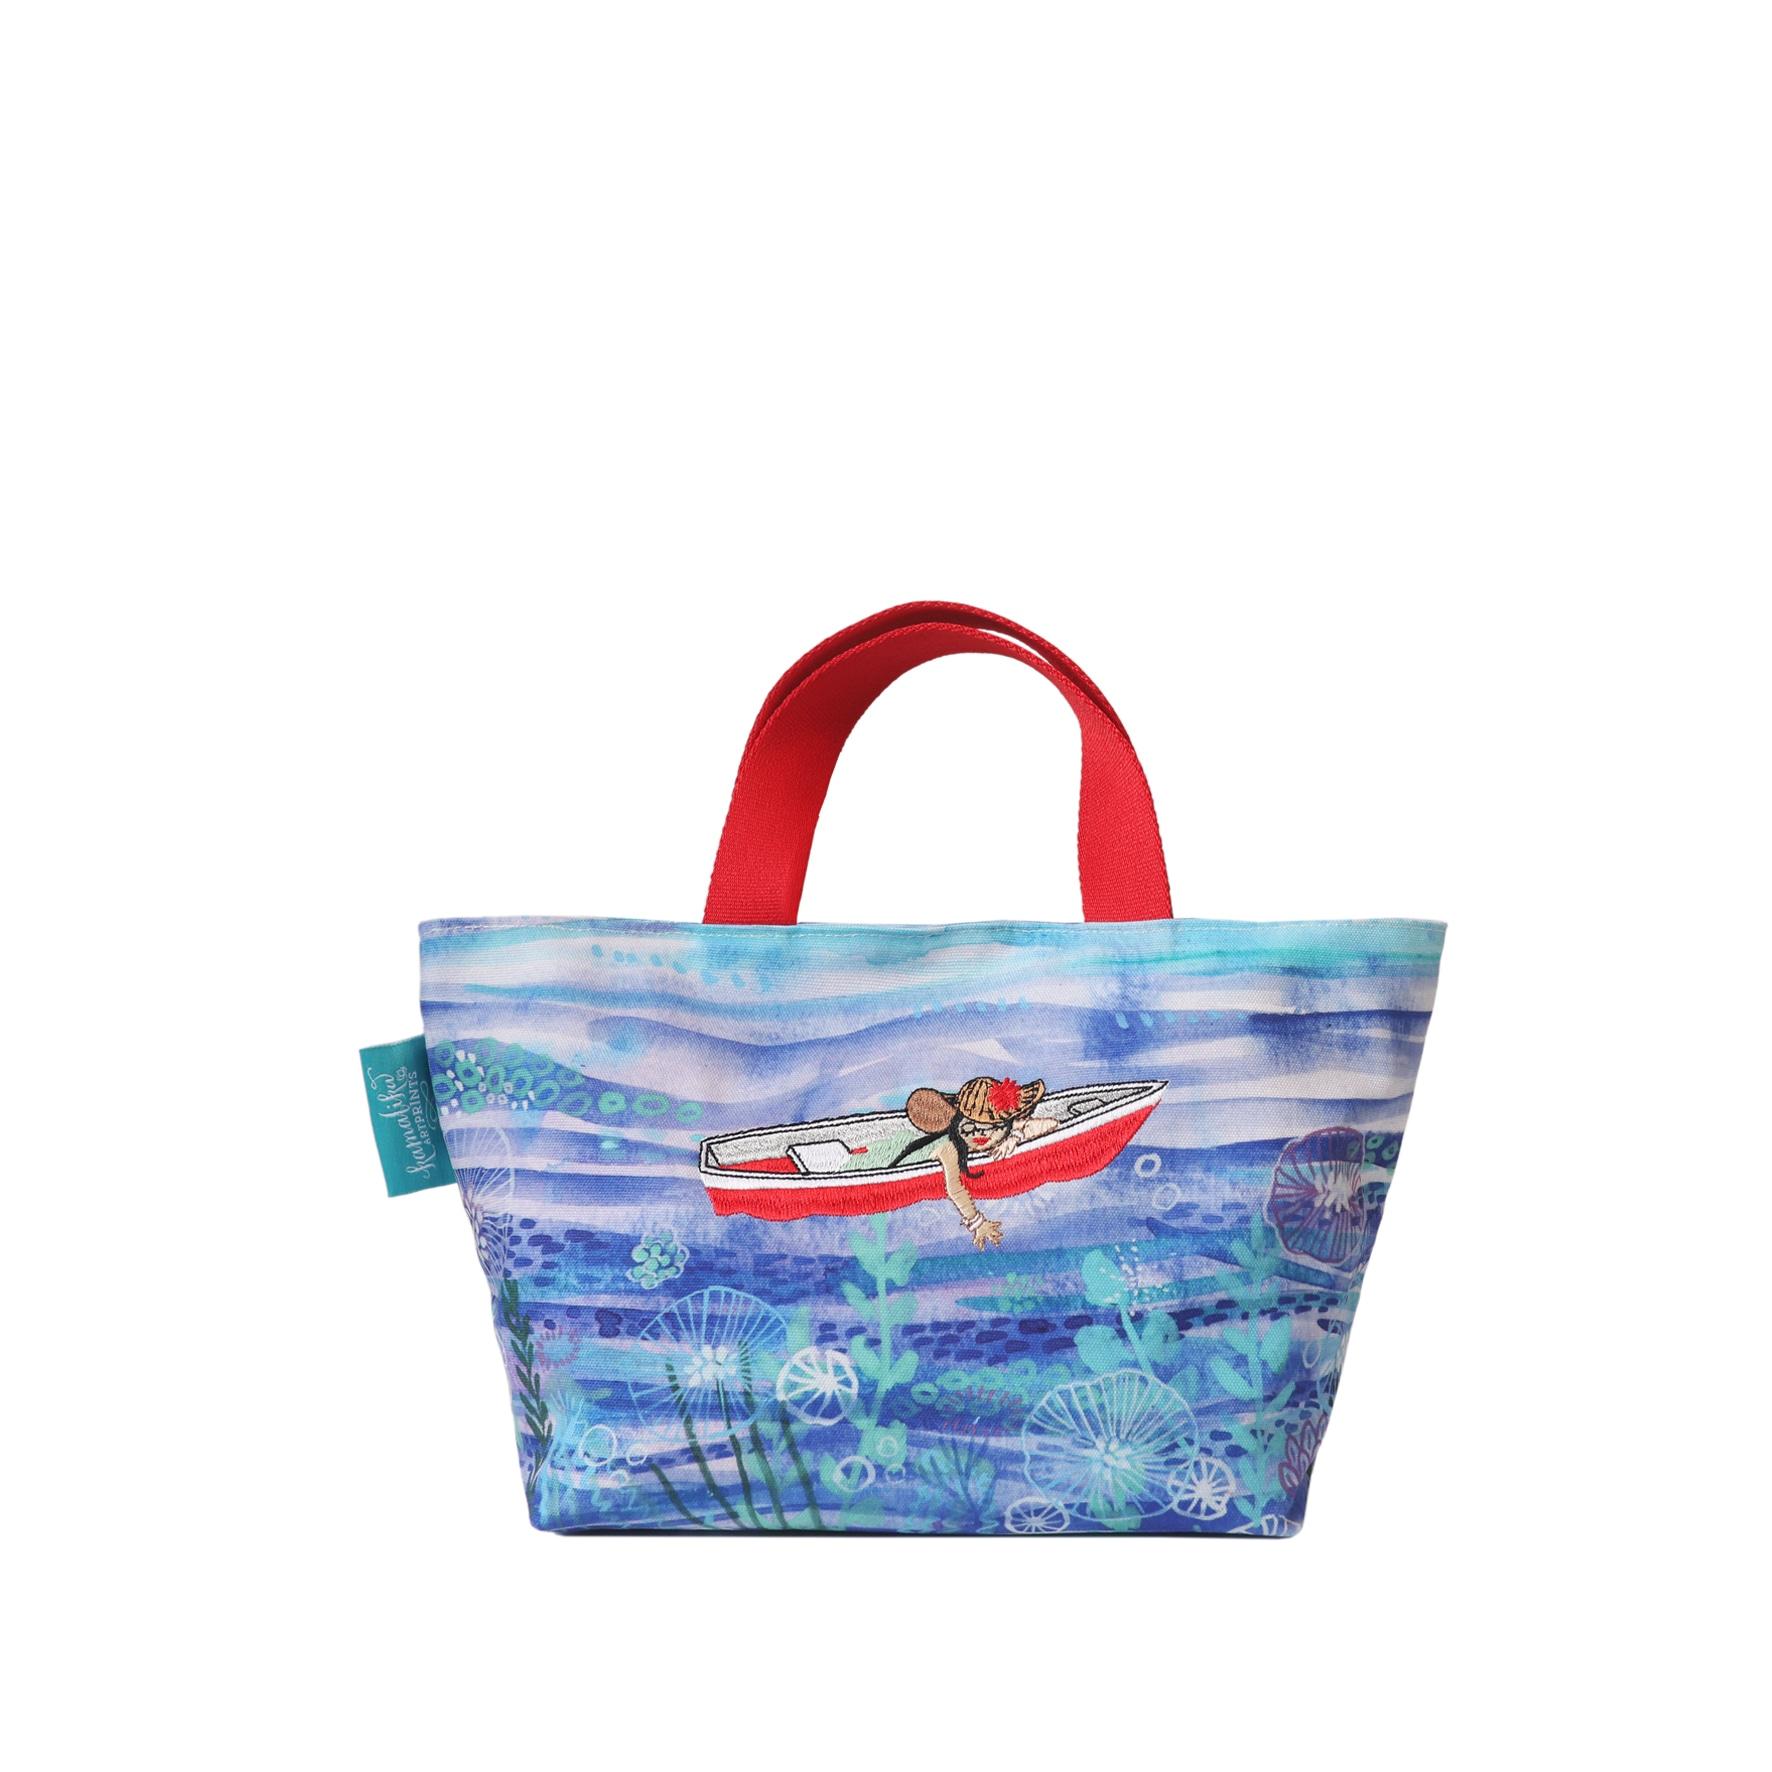 Bermain di Lautan Lunch Bag Small